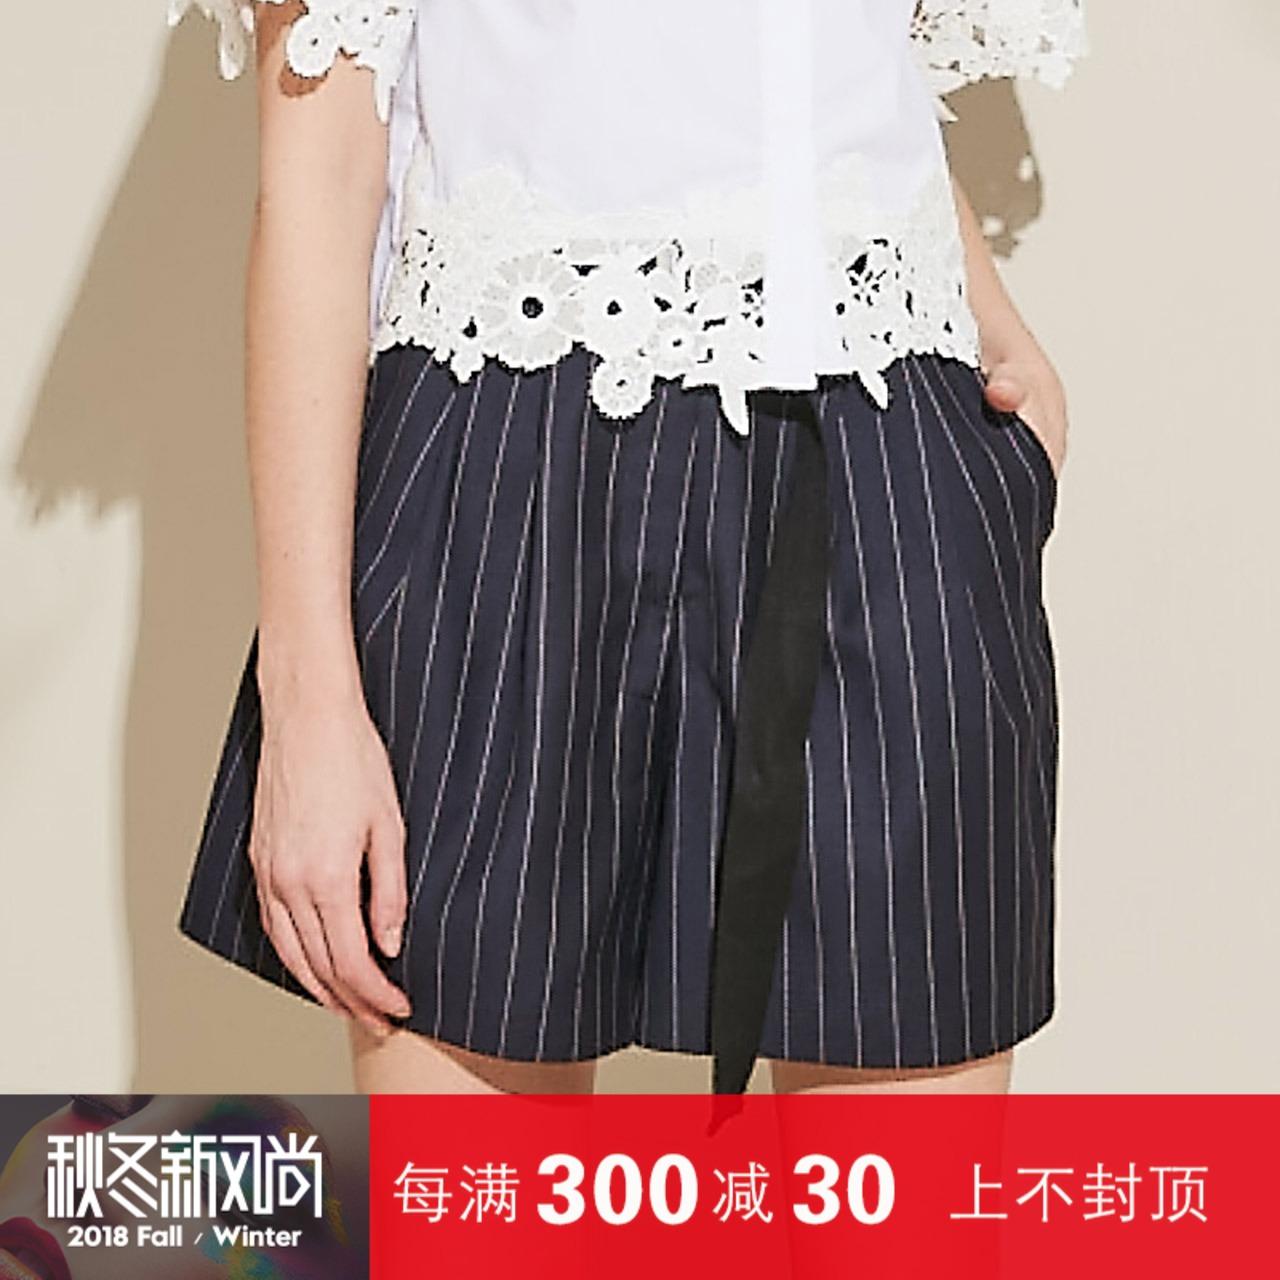 z11女装夏季薄款休闲宽松条纹系带高腰A字阔腿短裤Z17BK431